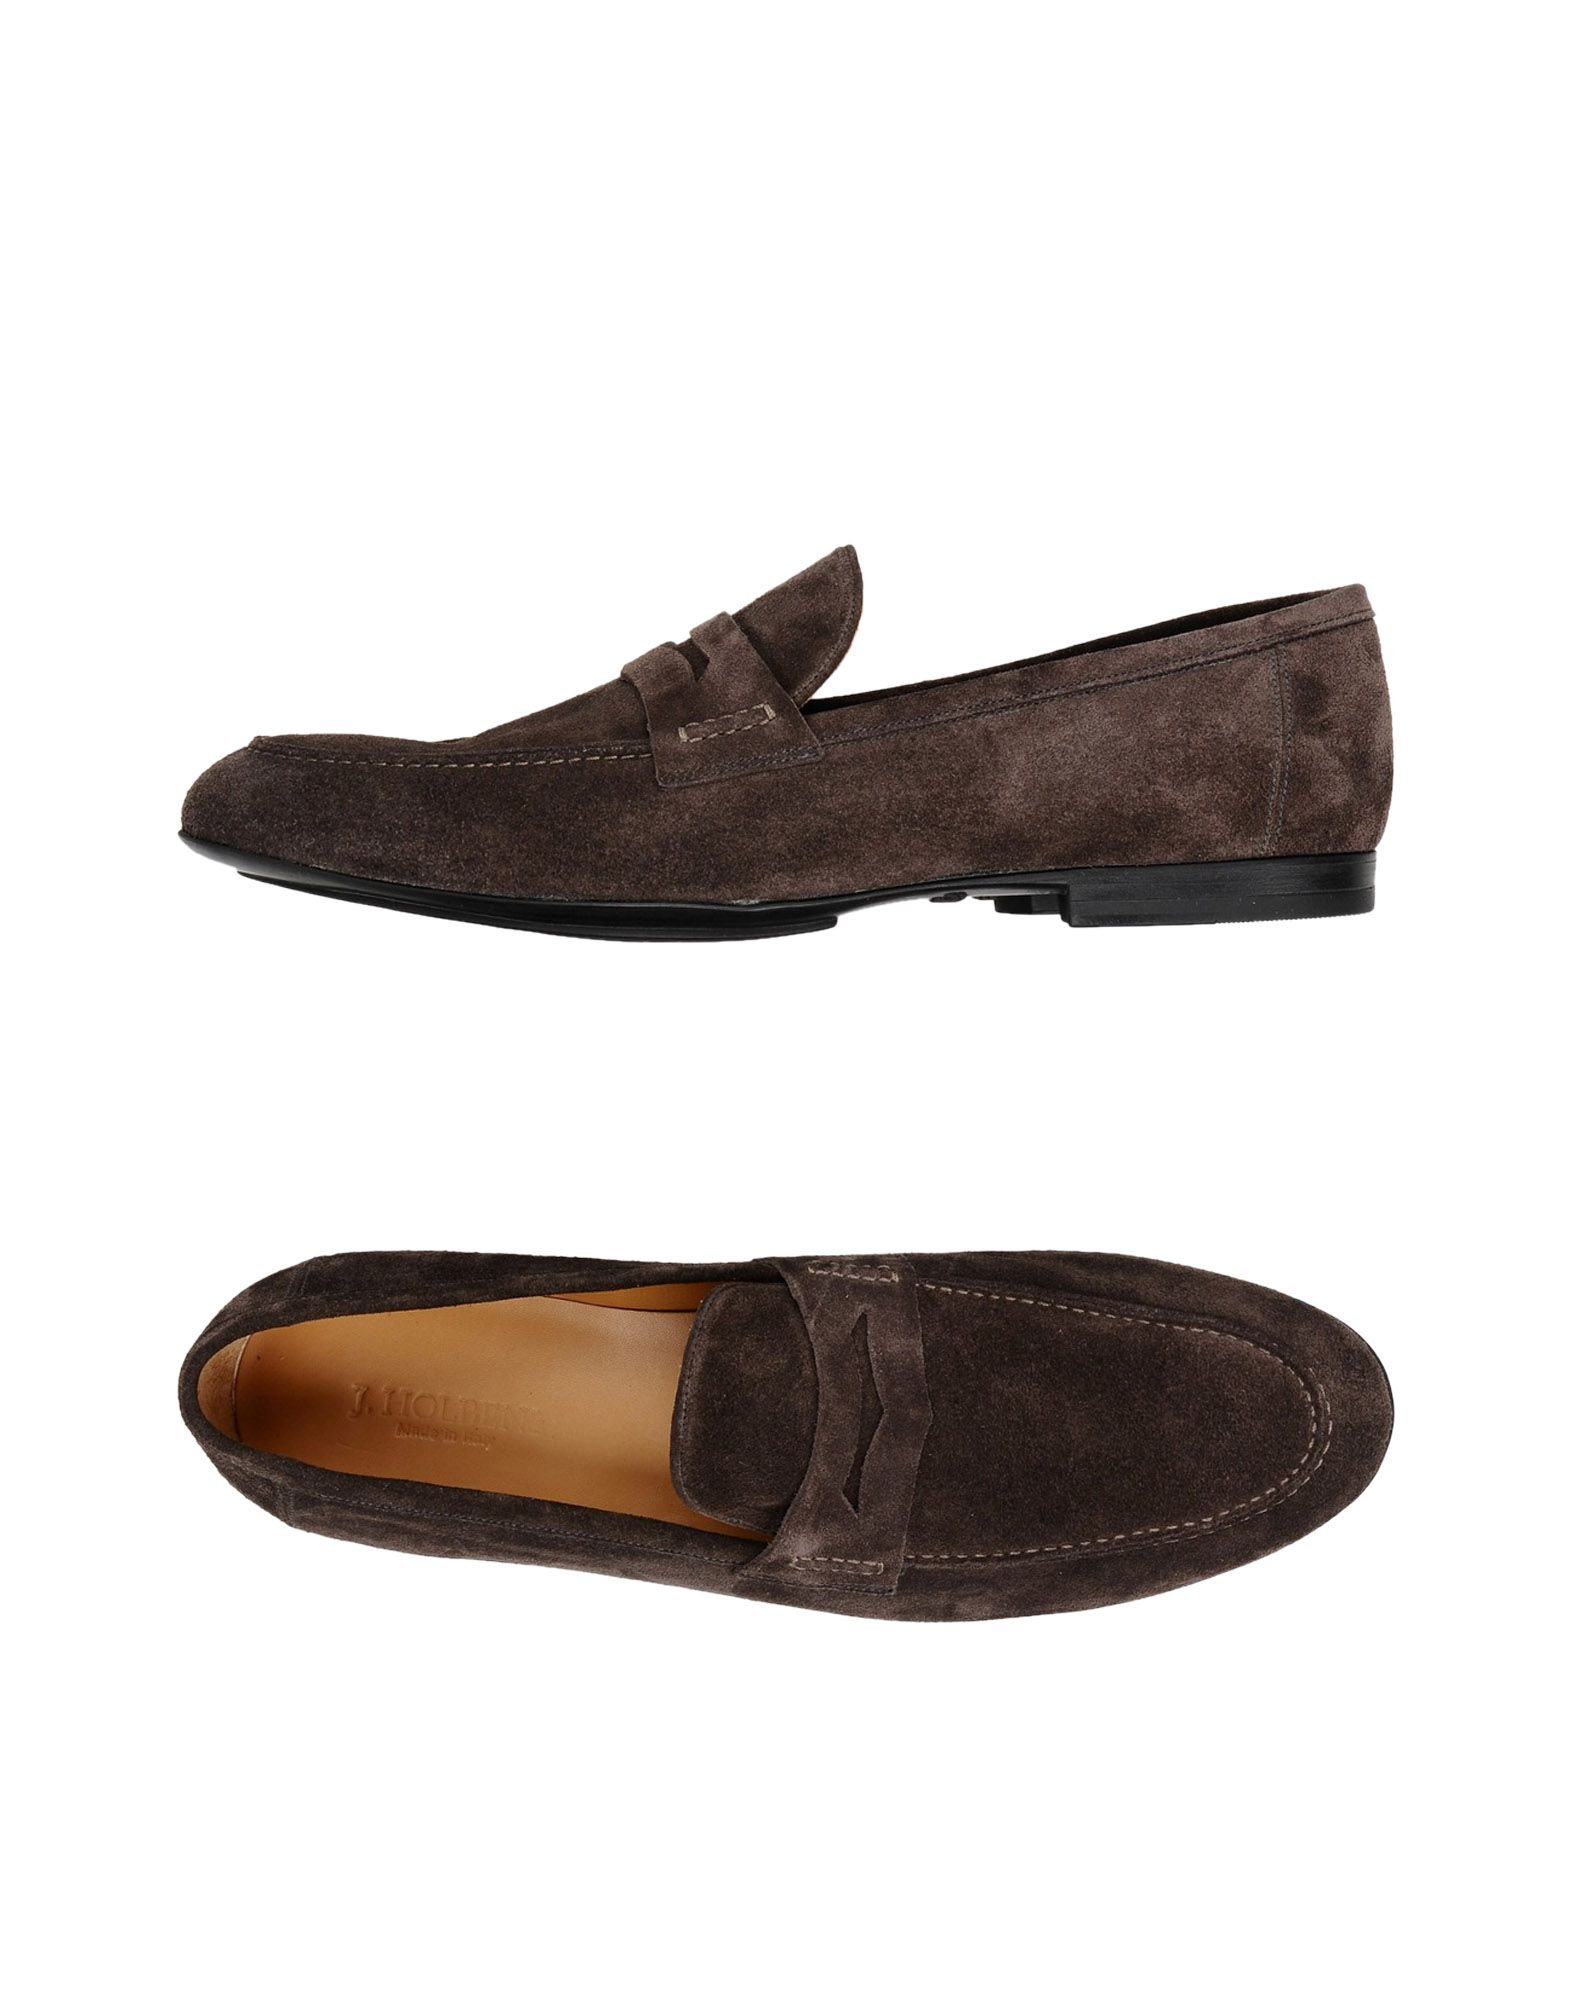 J. Holbens T9783s  11425421AG Schuhe Heiße Schuhe 11425421AG db1f87